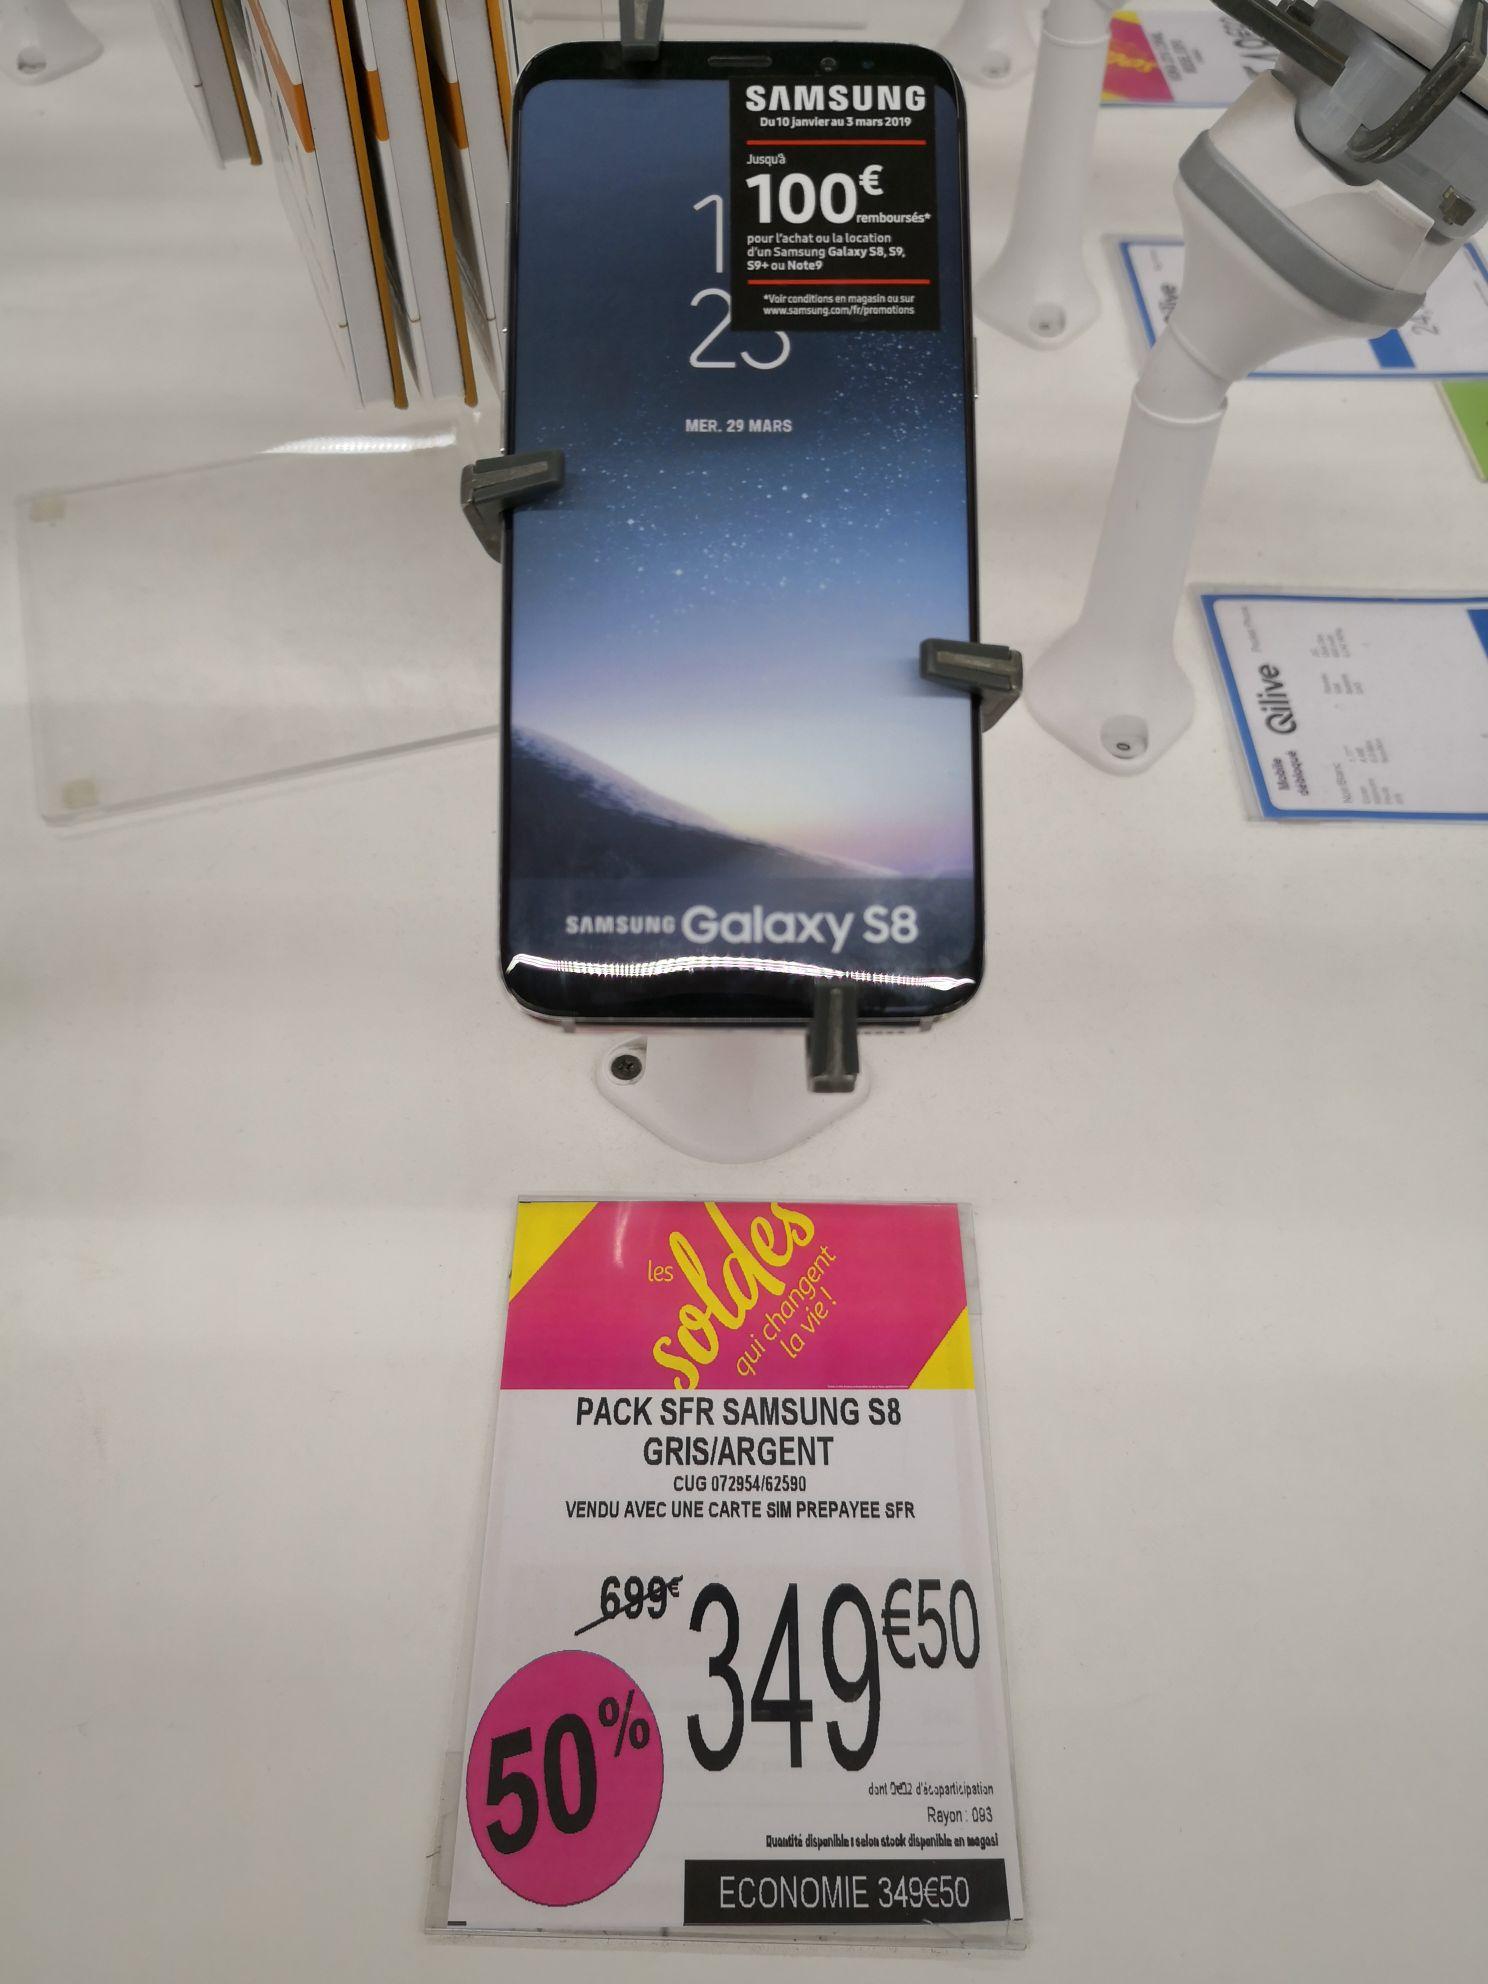 "Smartphone 5.8"" Samsung Galaxy S8 - 64 Go (via ODR de 100€) - Saint-Jean-de-la-Ruelle (45)"